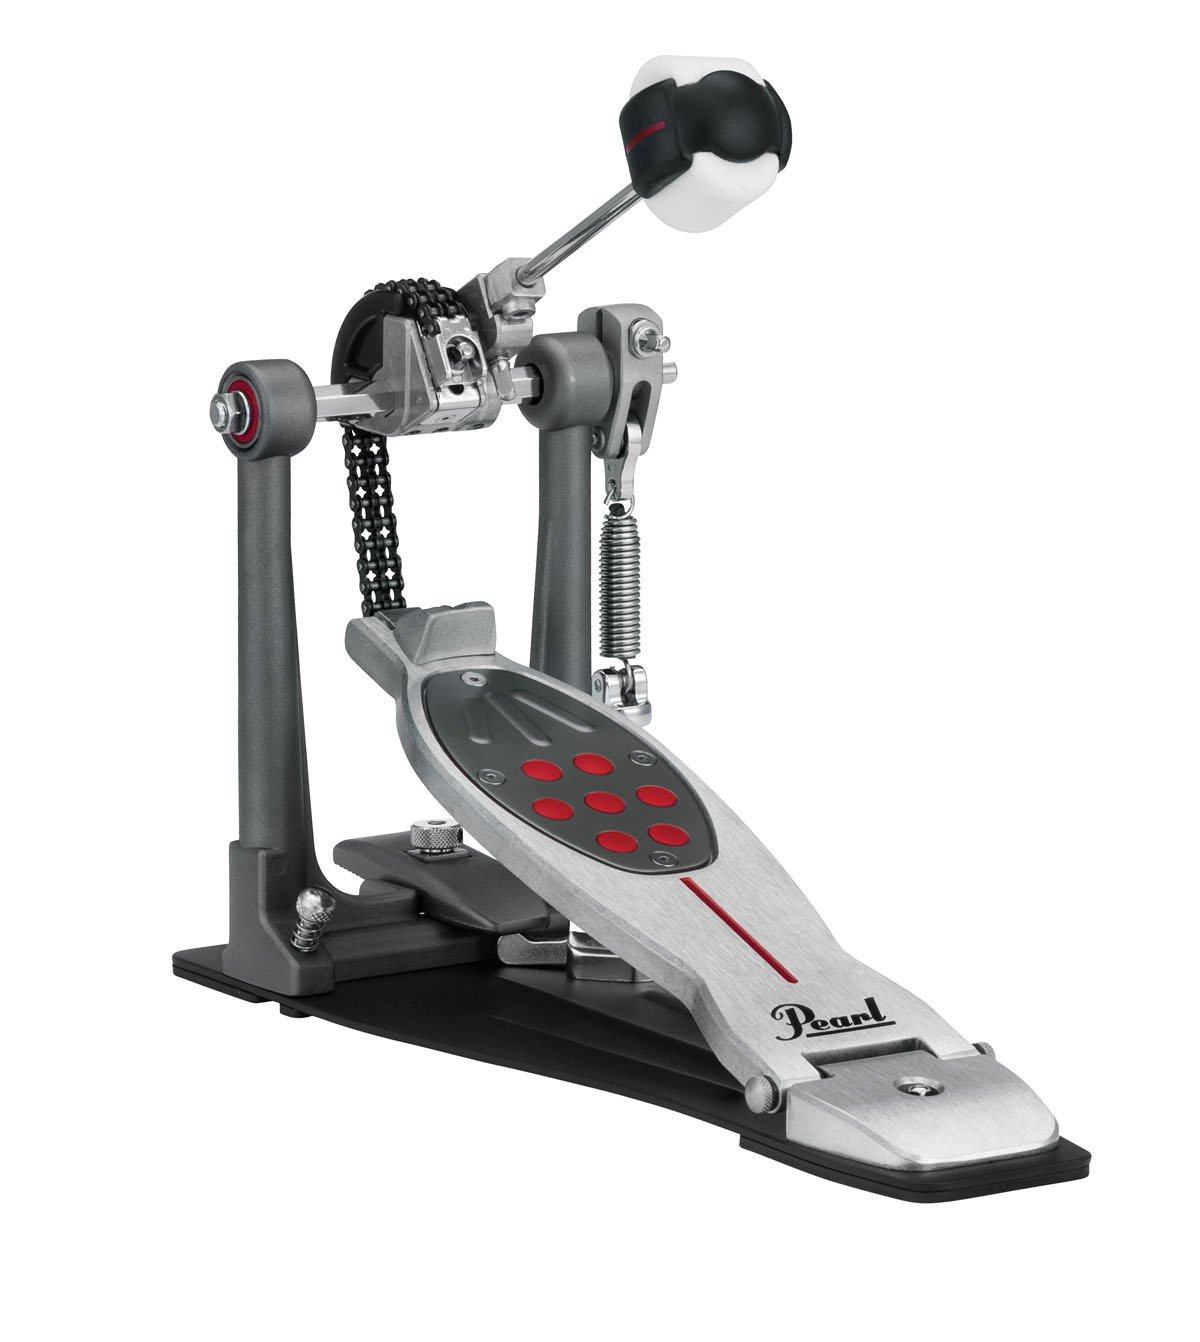 Eliminator Redline Chain Drive - Double Kick Pedal Conversion Kit